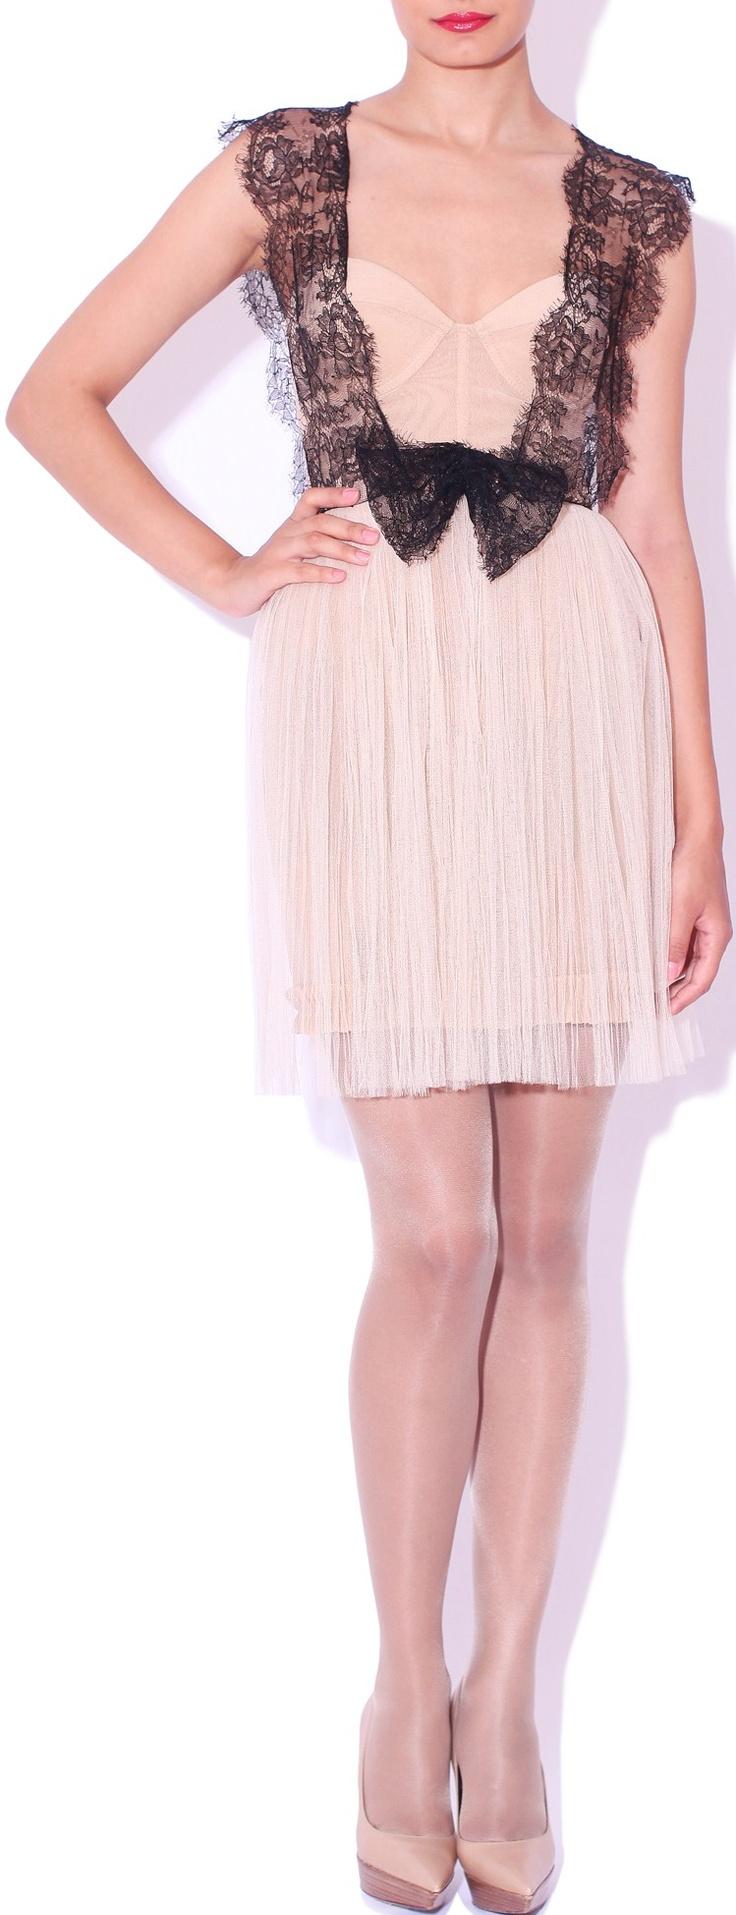 Mejores 48 imágenes de FS Dress to impress en Pinterest | Vestidos ...